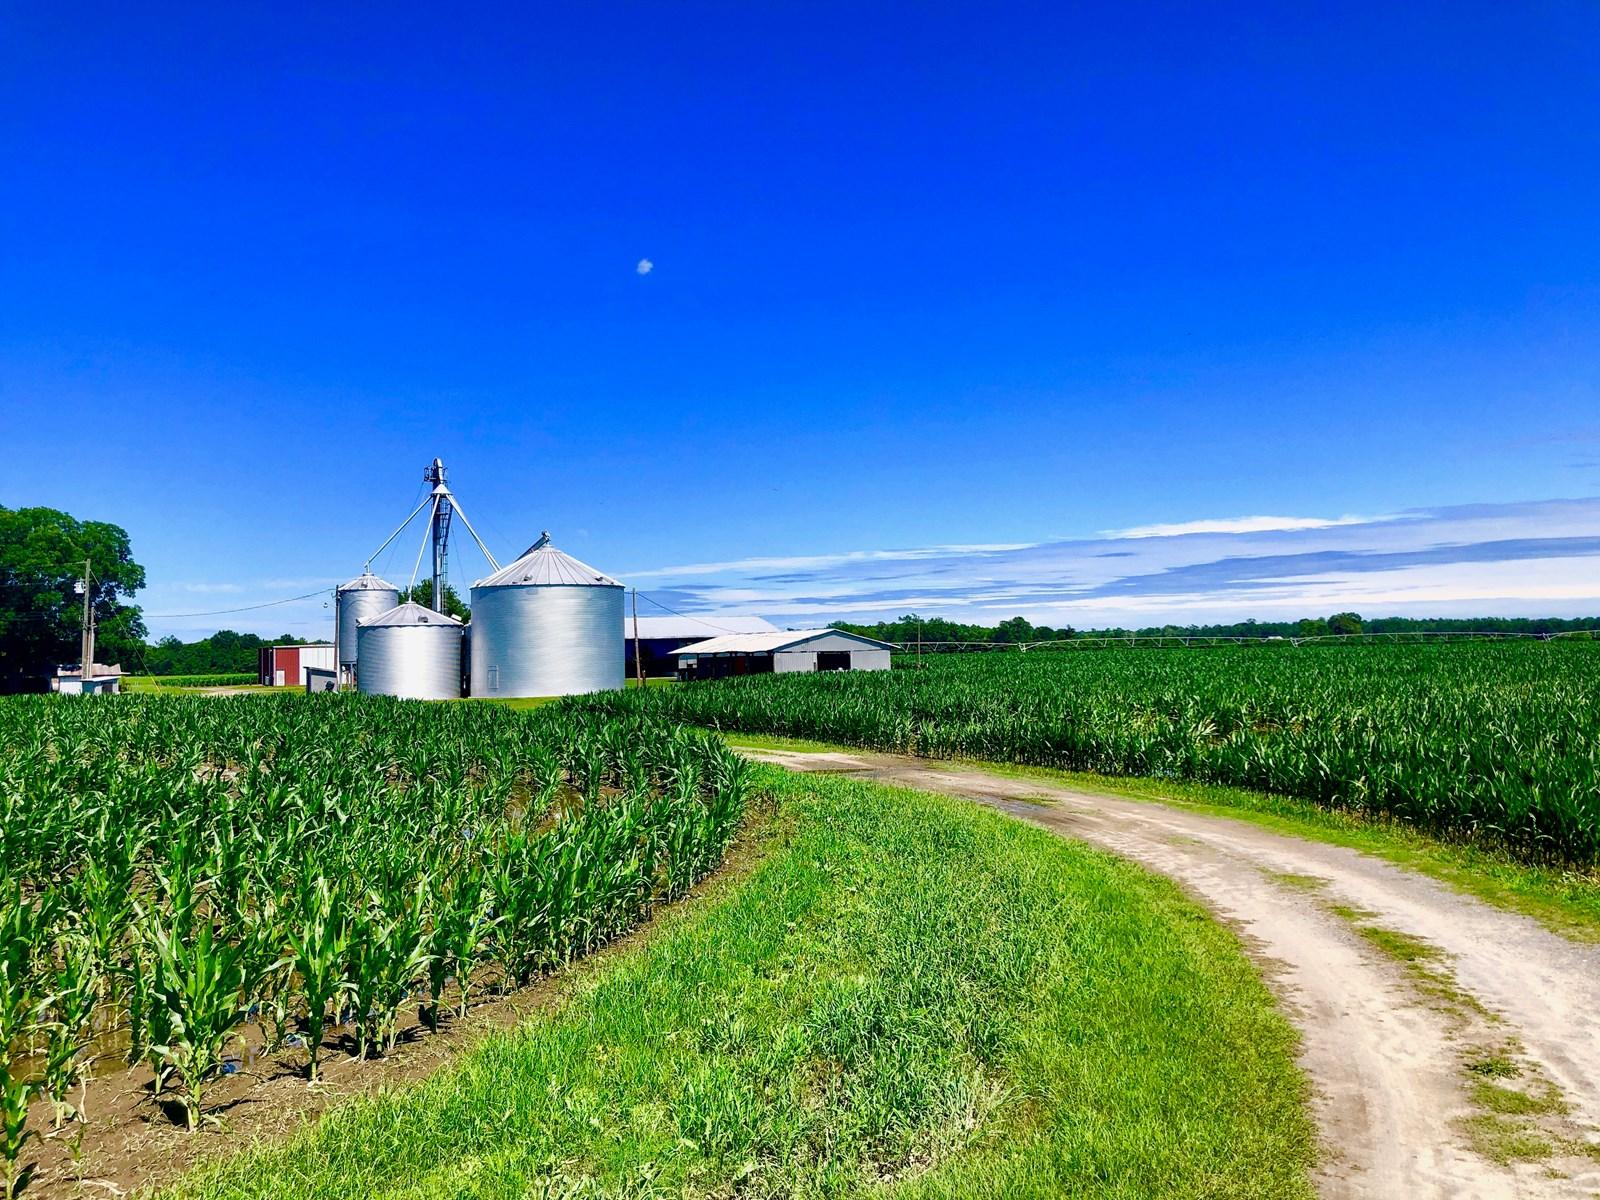 Farmland For Sale in Edgecombe County NC, Irrigated Farmland